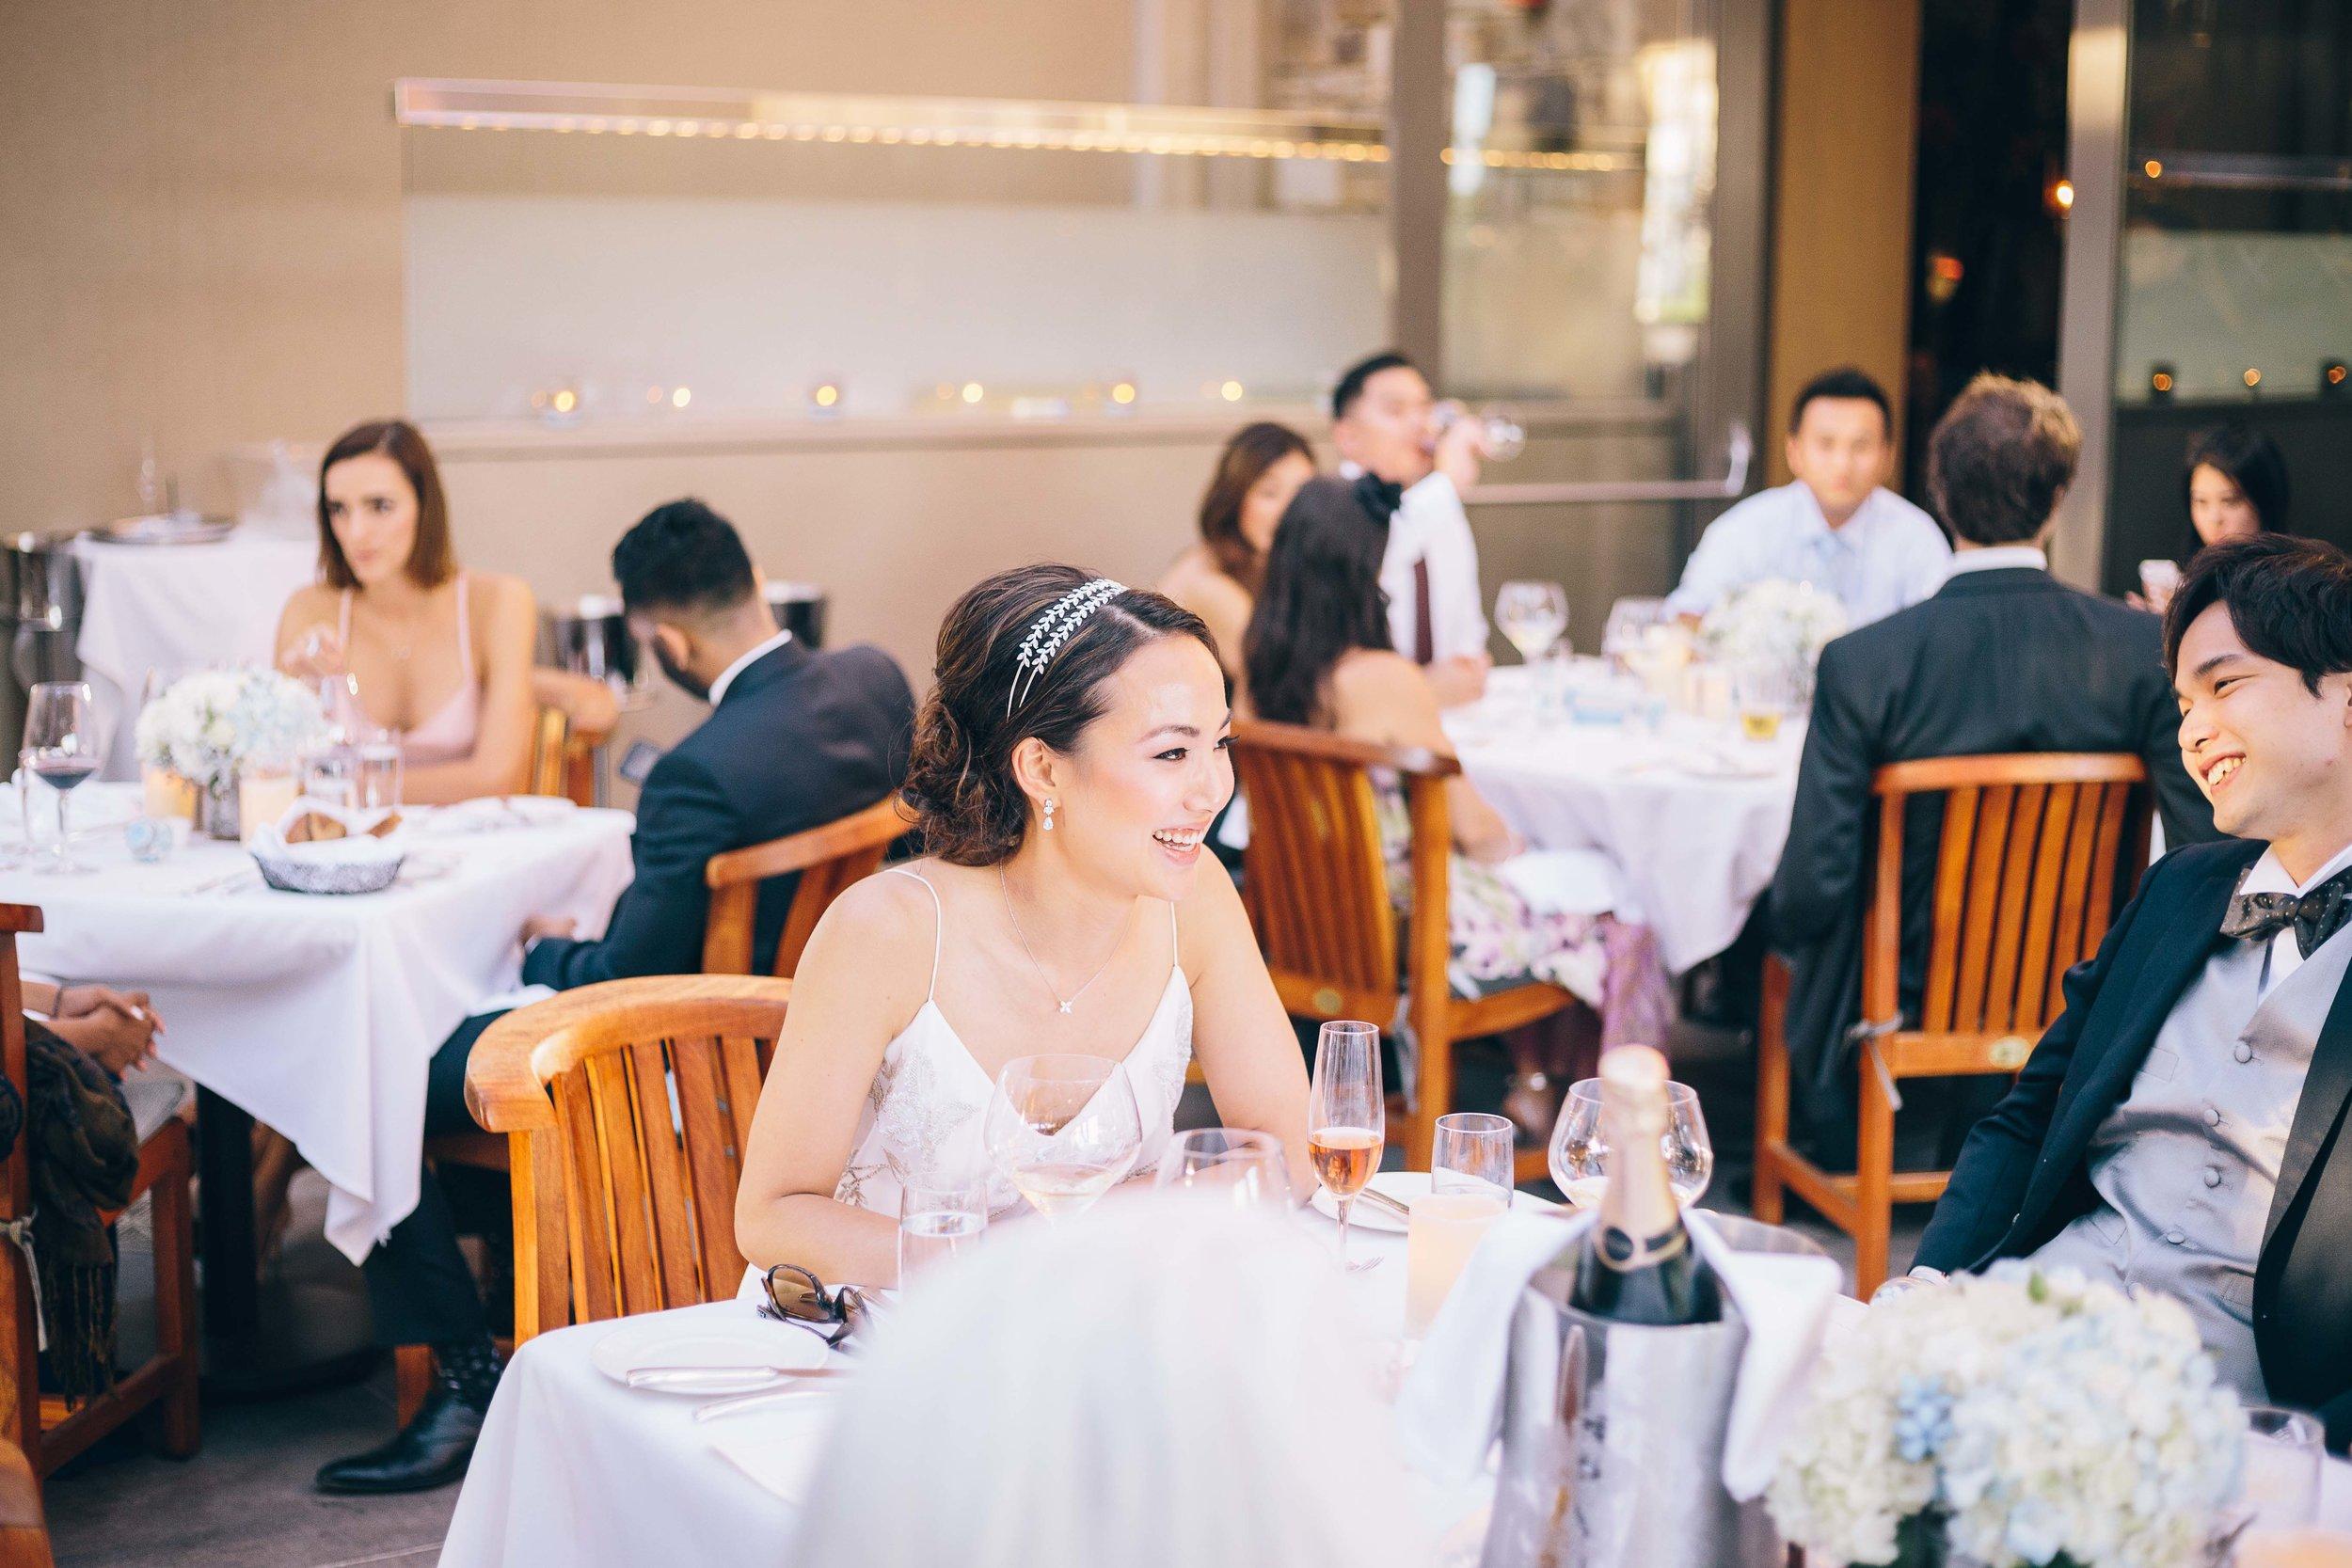 Westin Verasa Wedding at La Toque - JBJ Pictures Wedding Photographer in Napa Sonoma and San Francisco - 1 (18).jpg